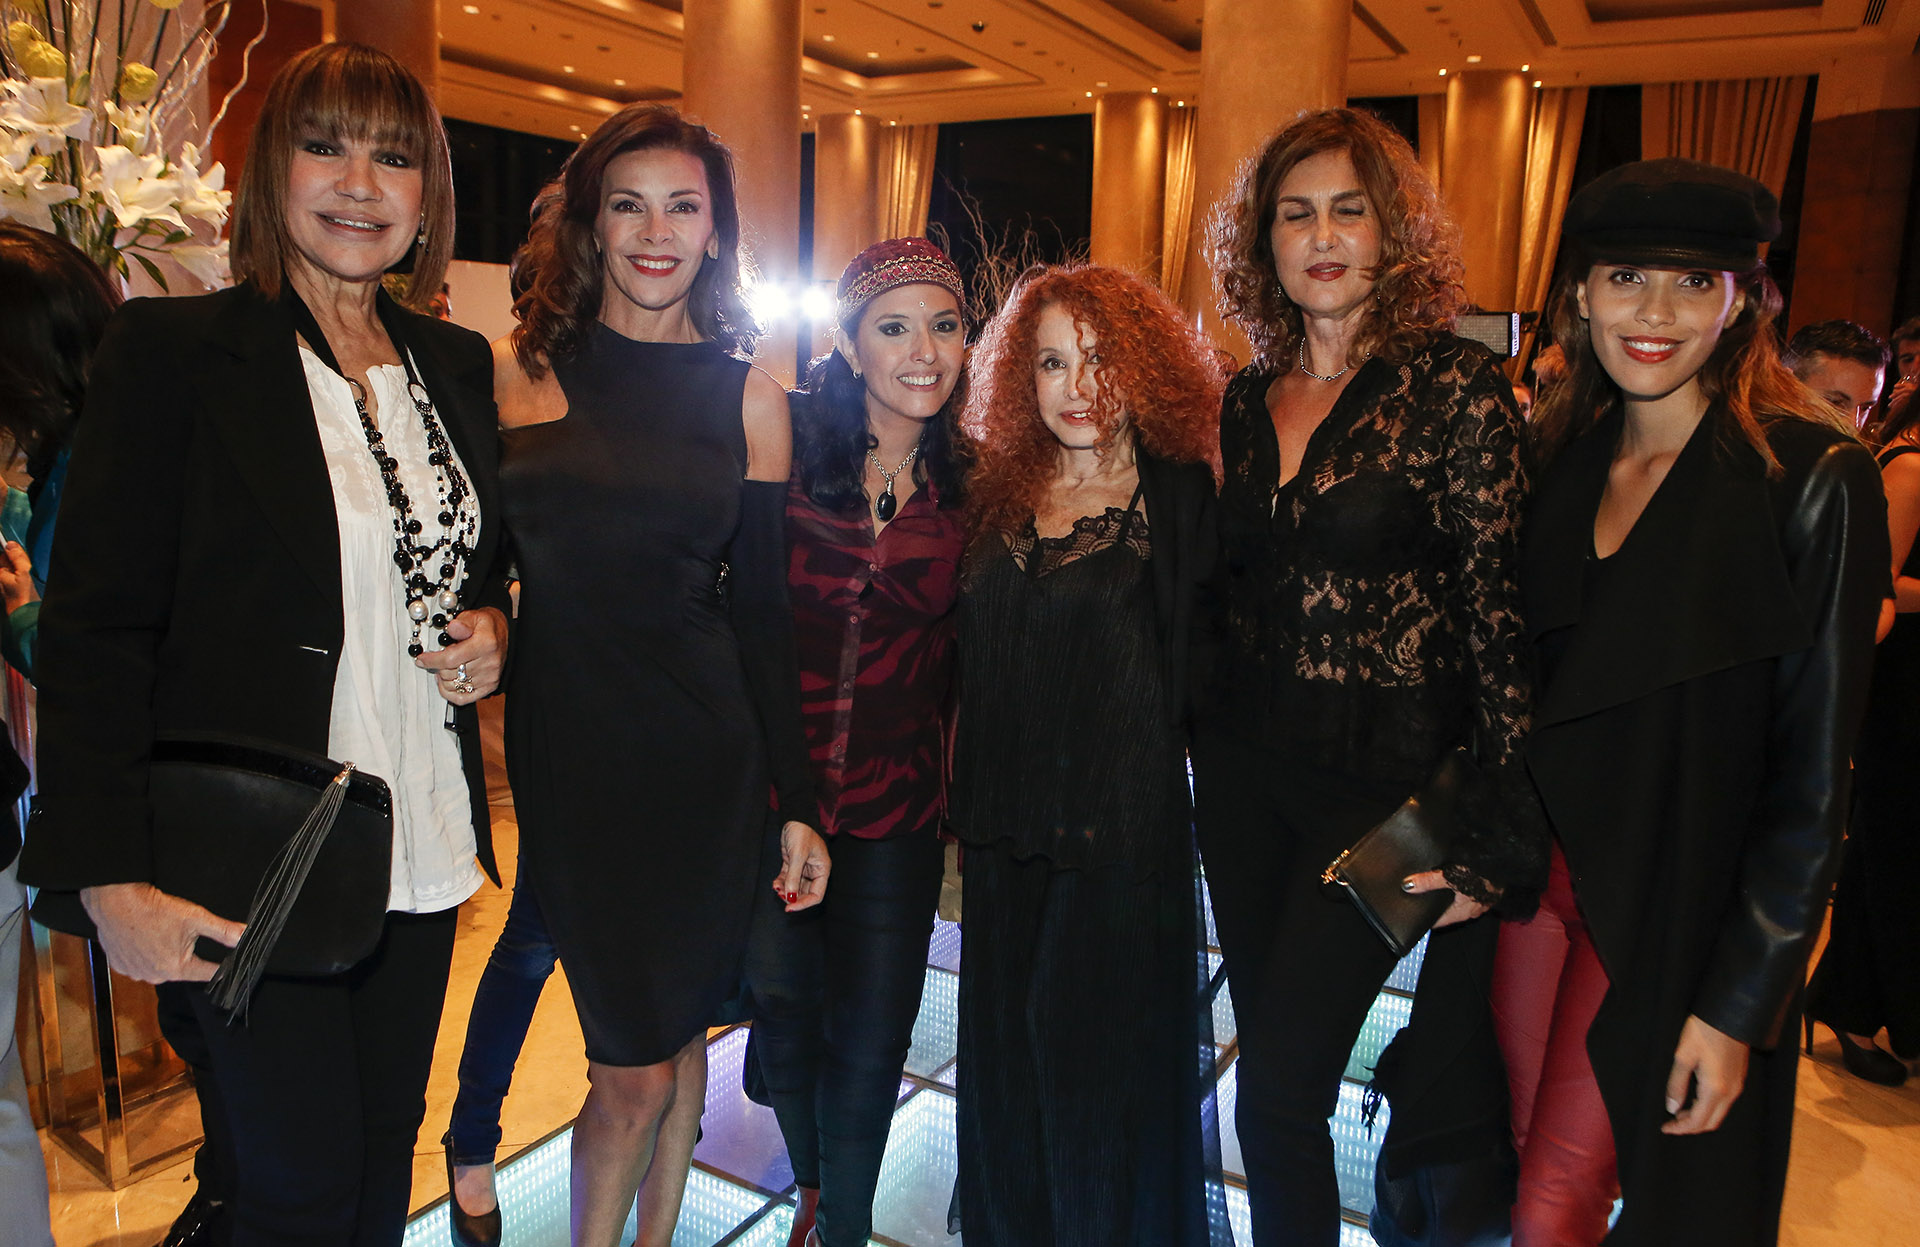 Mora Furtado, Fabiana Araujo, Jimena La Torre, Maureene Dinar, Susana Milano y Taina Laurino Ferreira